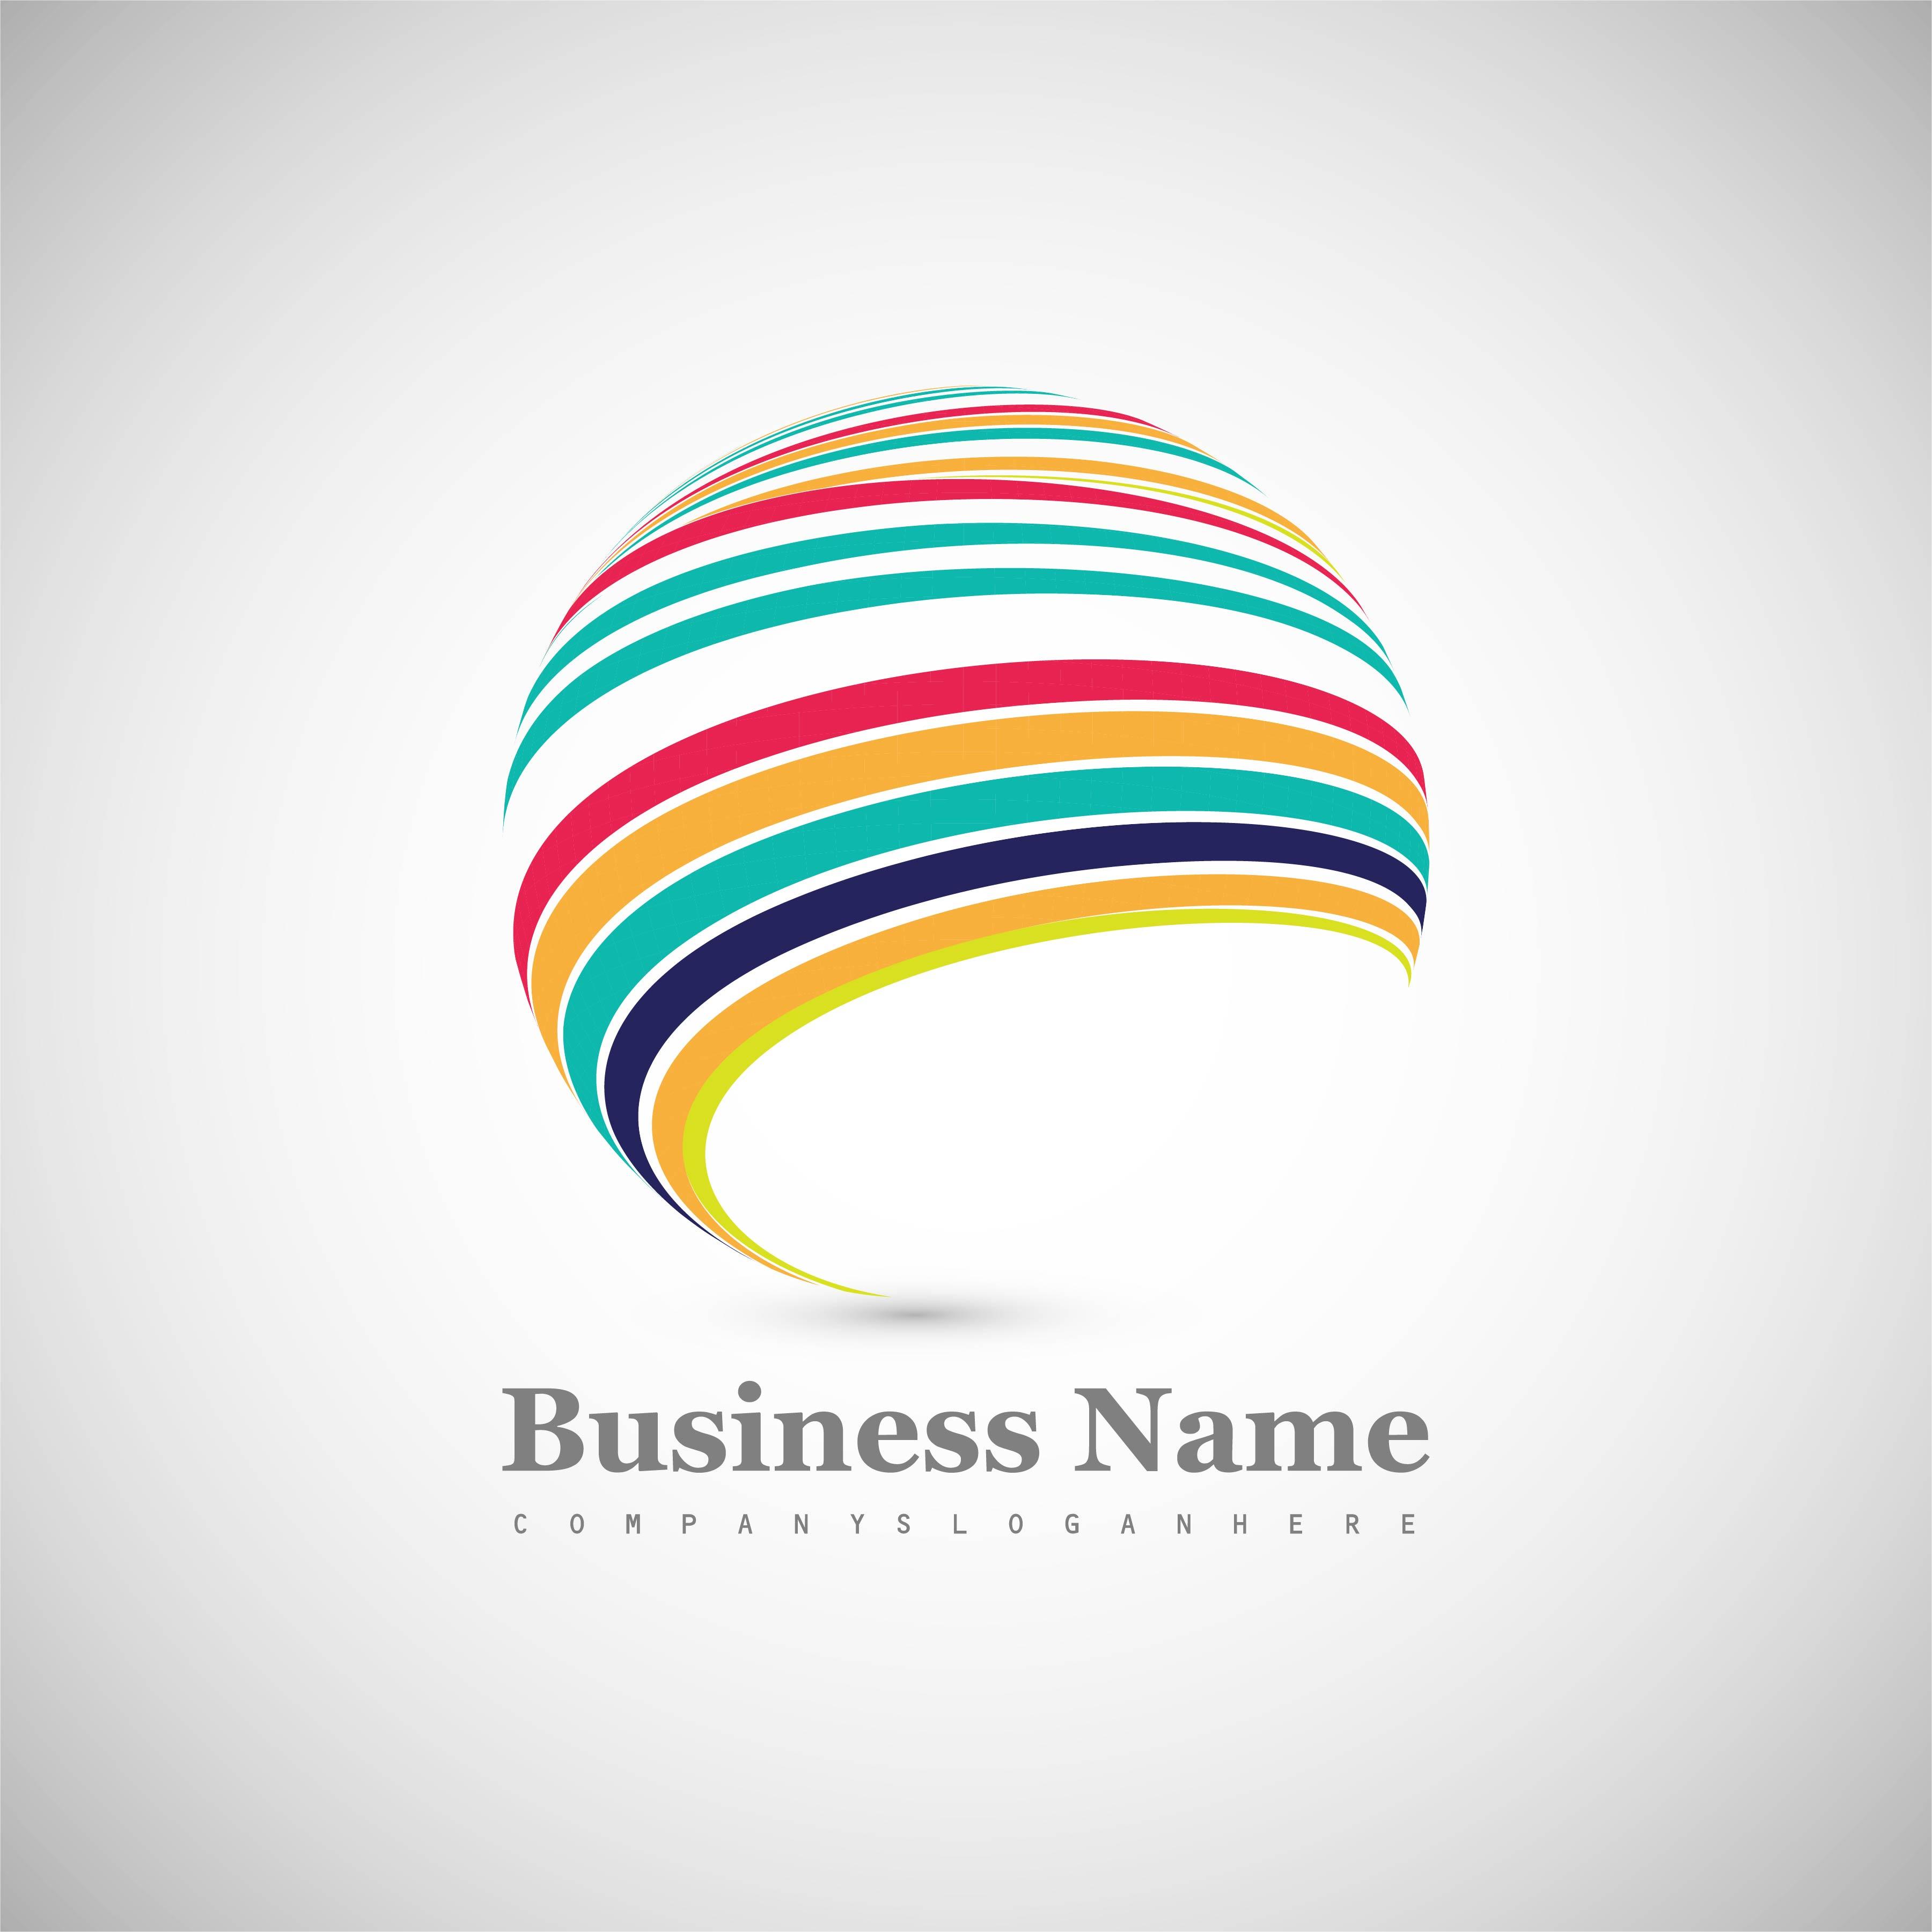 Beautiful Colorful Sphere Creative Logo Design Download Free Vectors Clipart Graphics Vector Art,French Interior Design Company Names